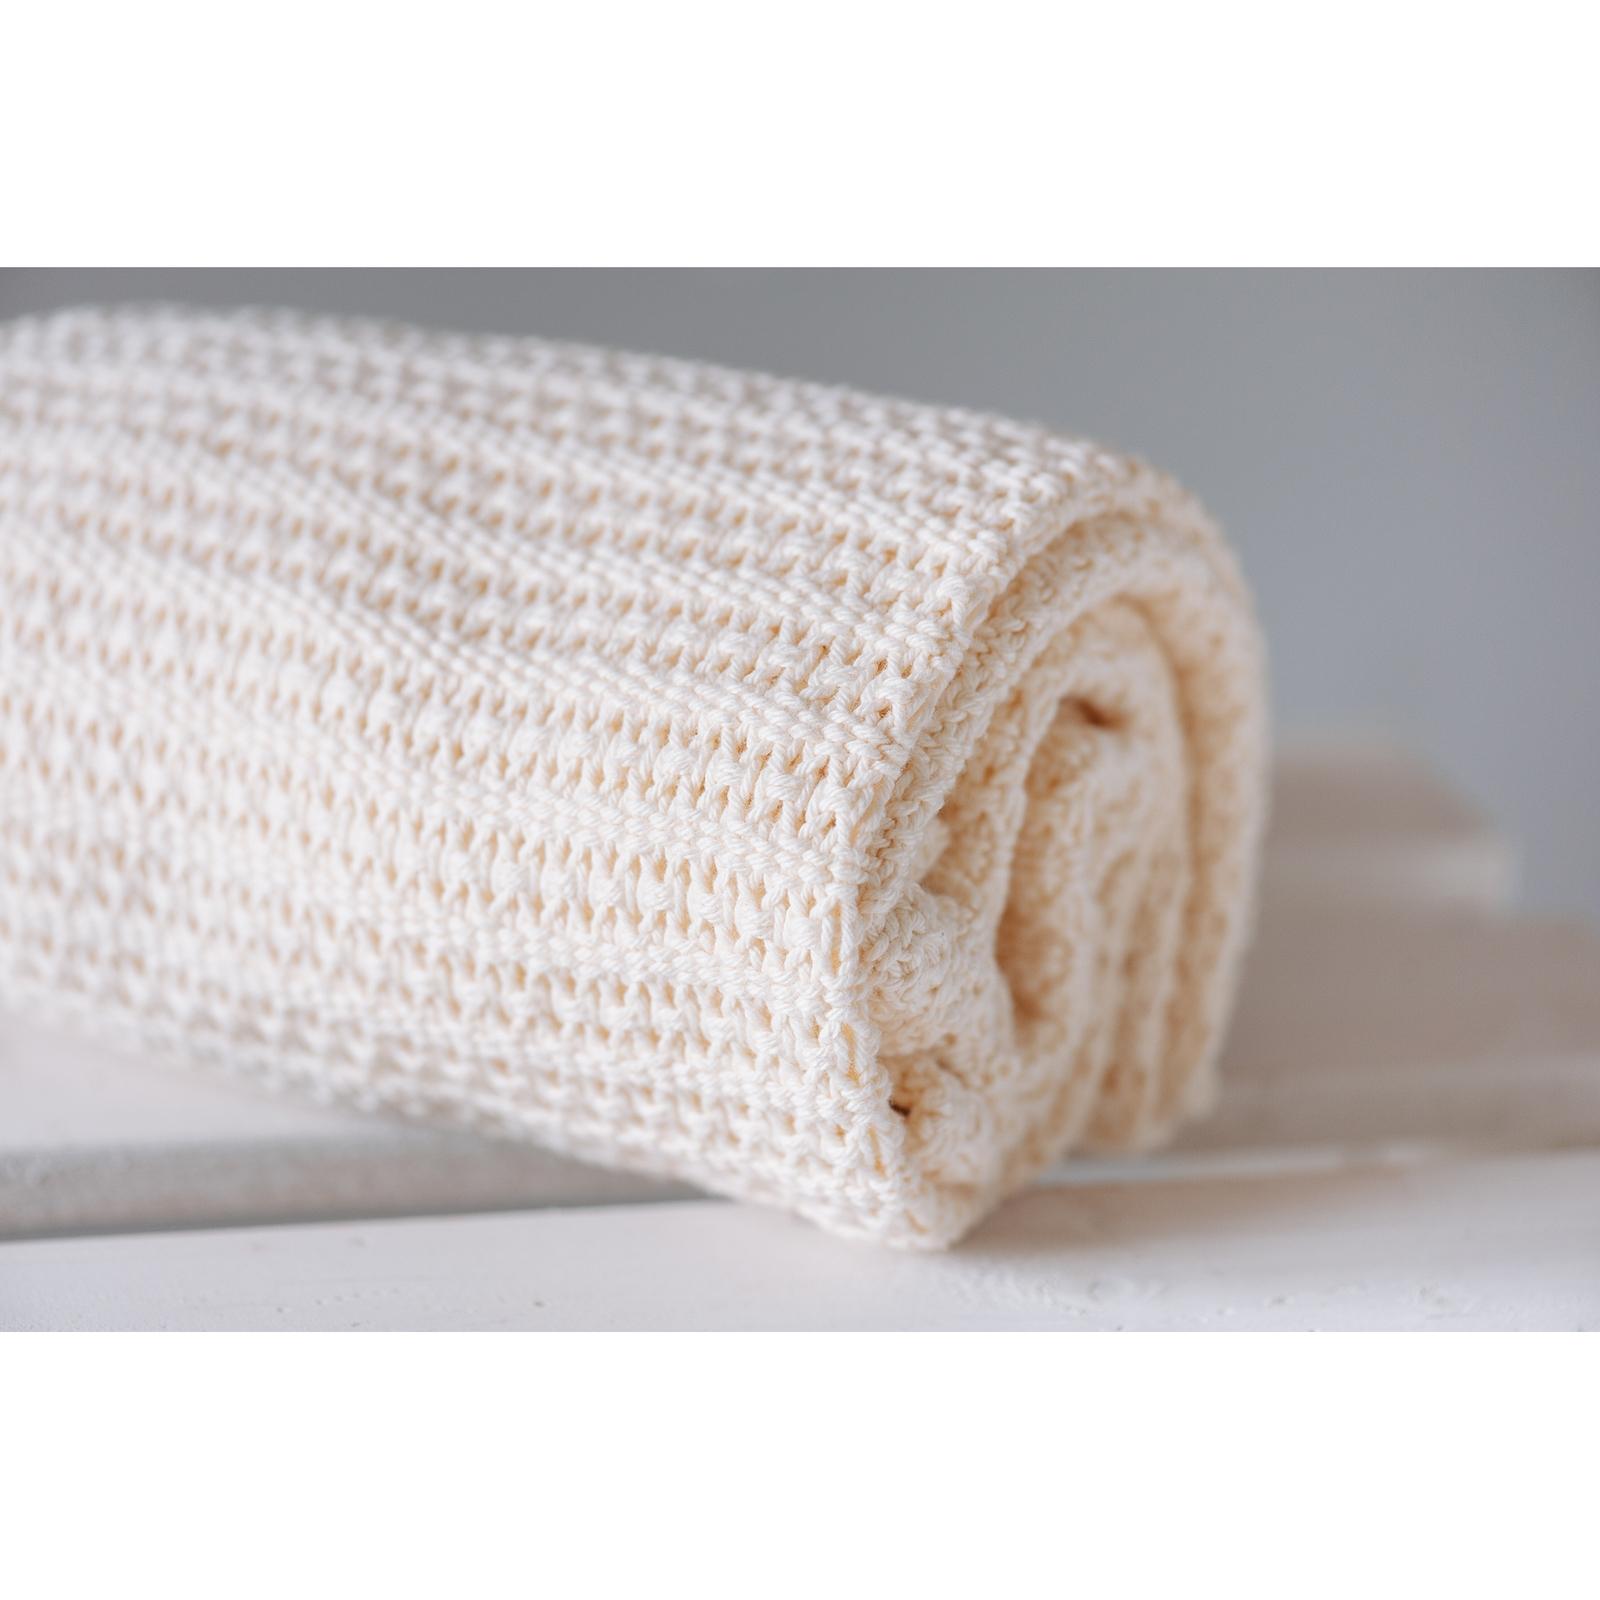 Cotton Cellular Blanket - Cream